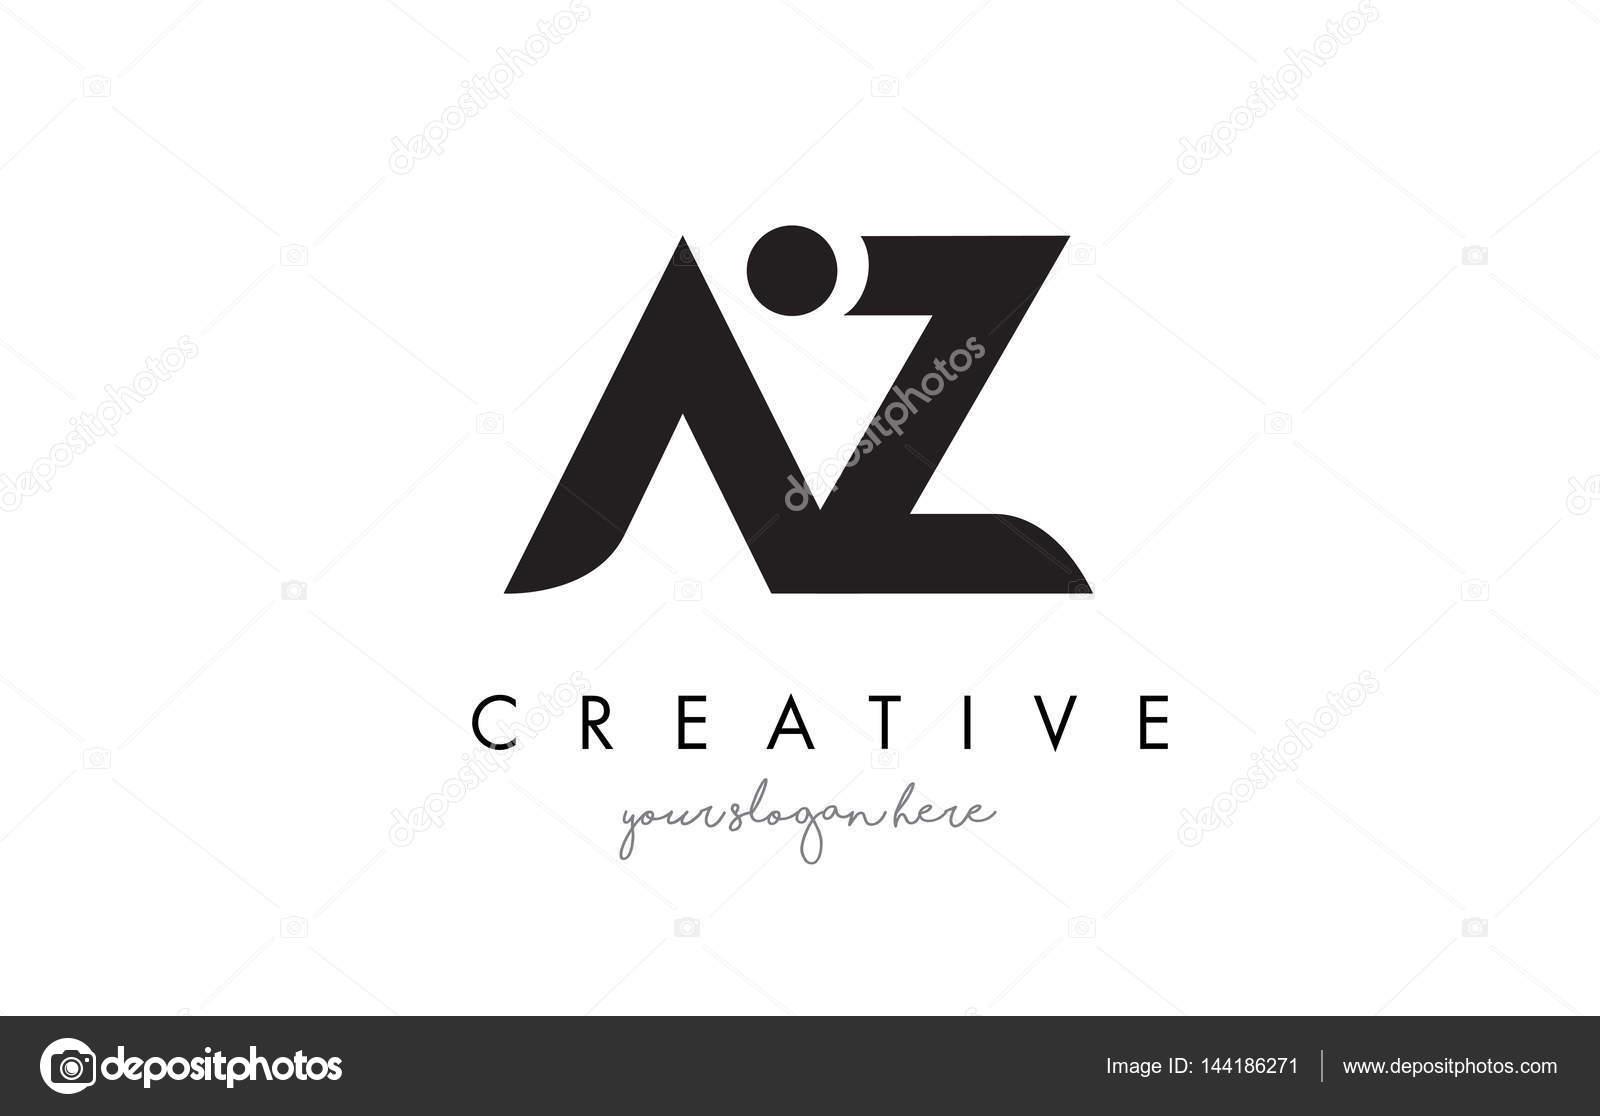 az letter logo design with creative modern trendy typography